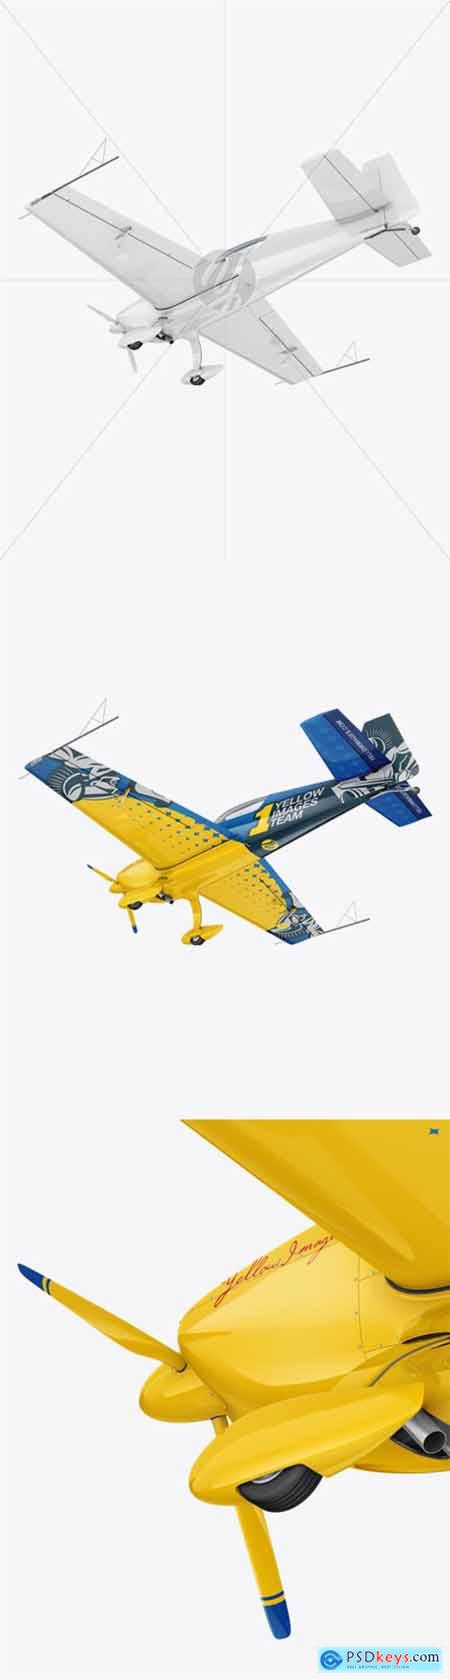 Sport Airplane Mockup - Half Side View (Bottom) 56195